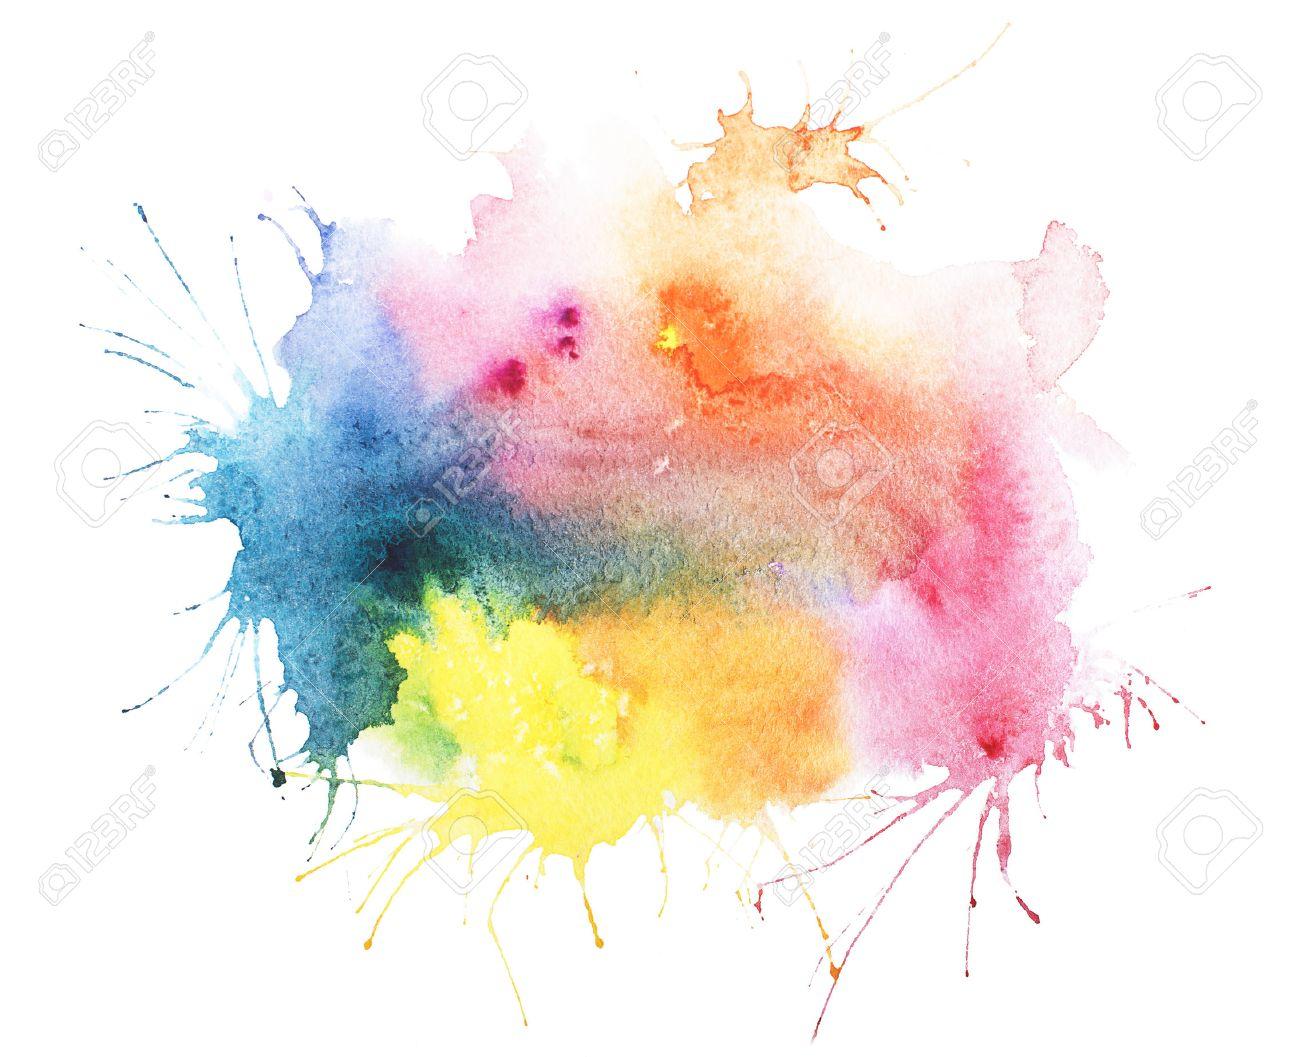 Image Aquarelle abstract watercolor aquarelle hand drawn blot colorful yellow